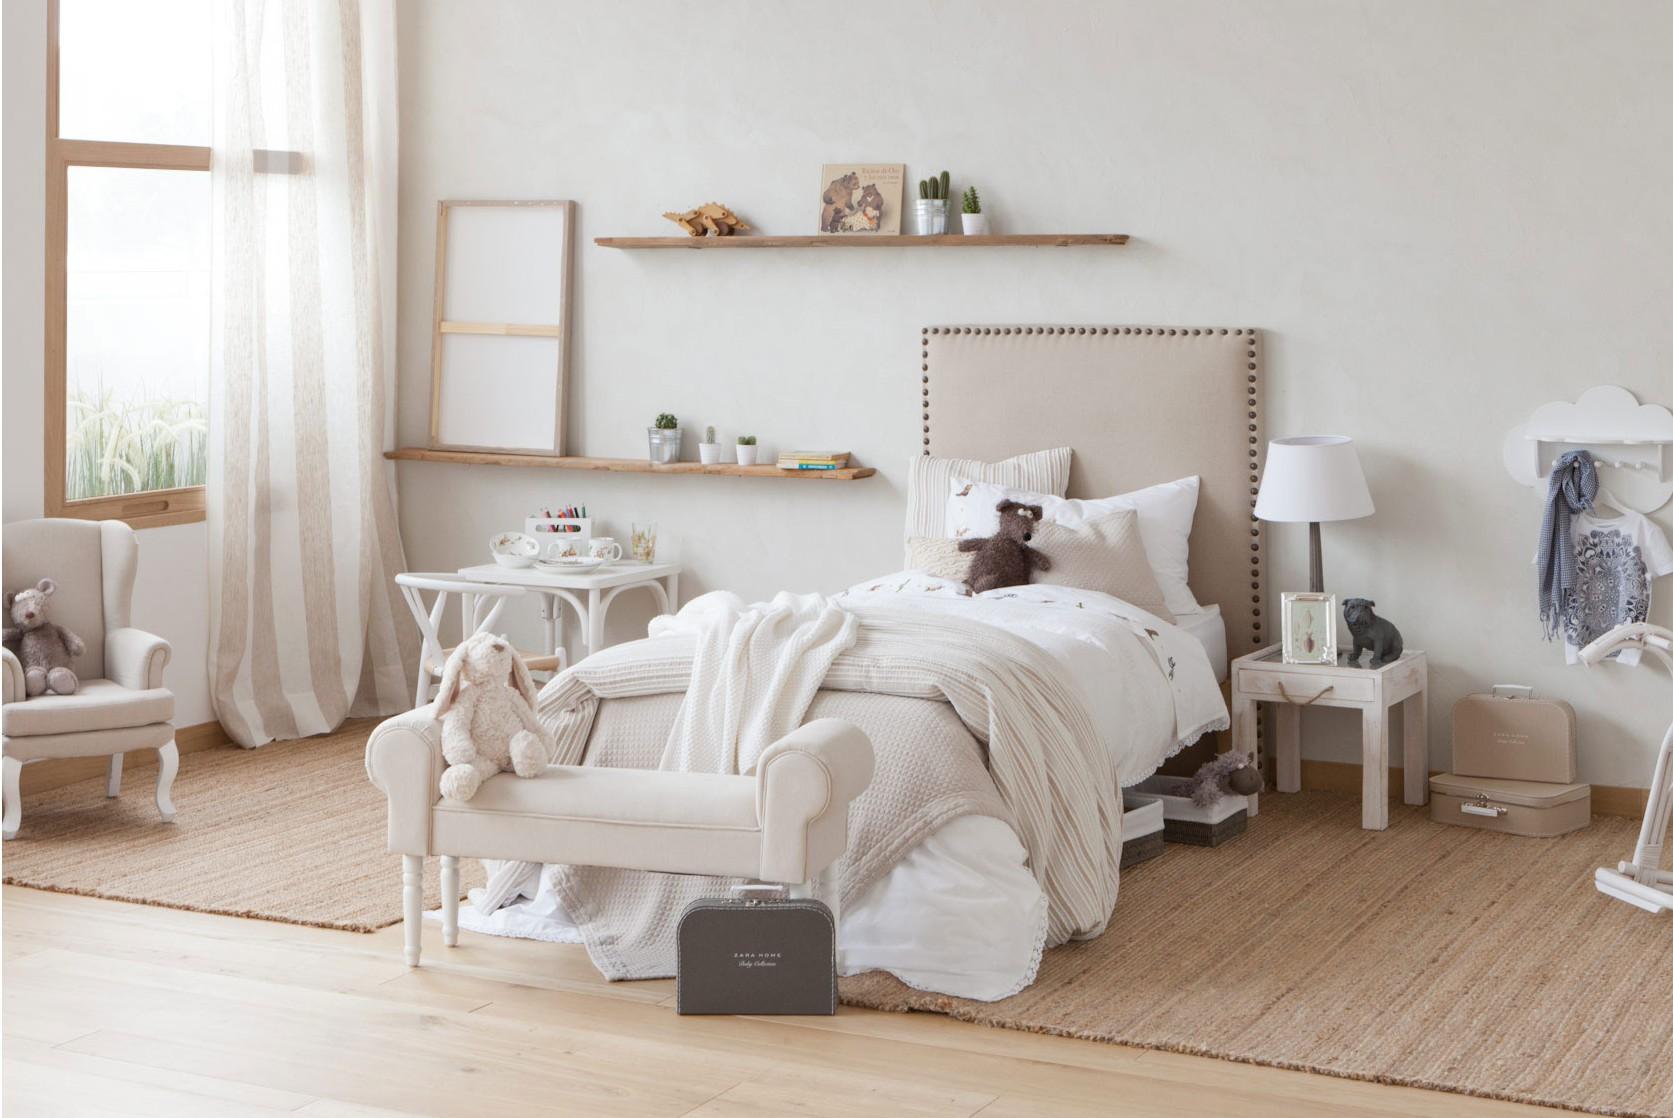 Tour De Lit Bb Zara Home Trendy Luxe Jet De Lit Ou De Canap U  # Meuble Tv Zara Home